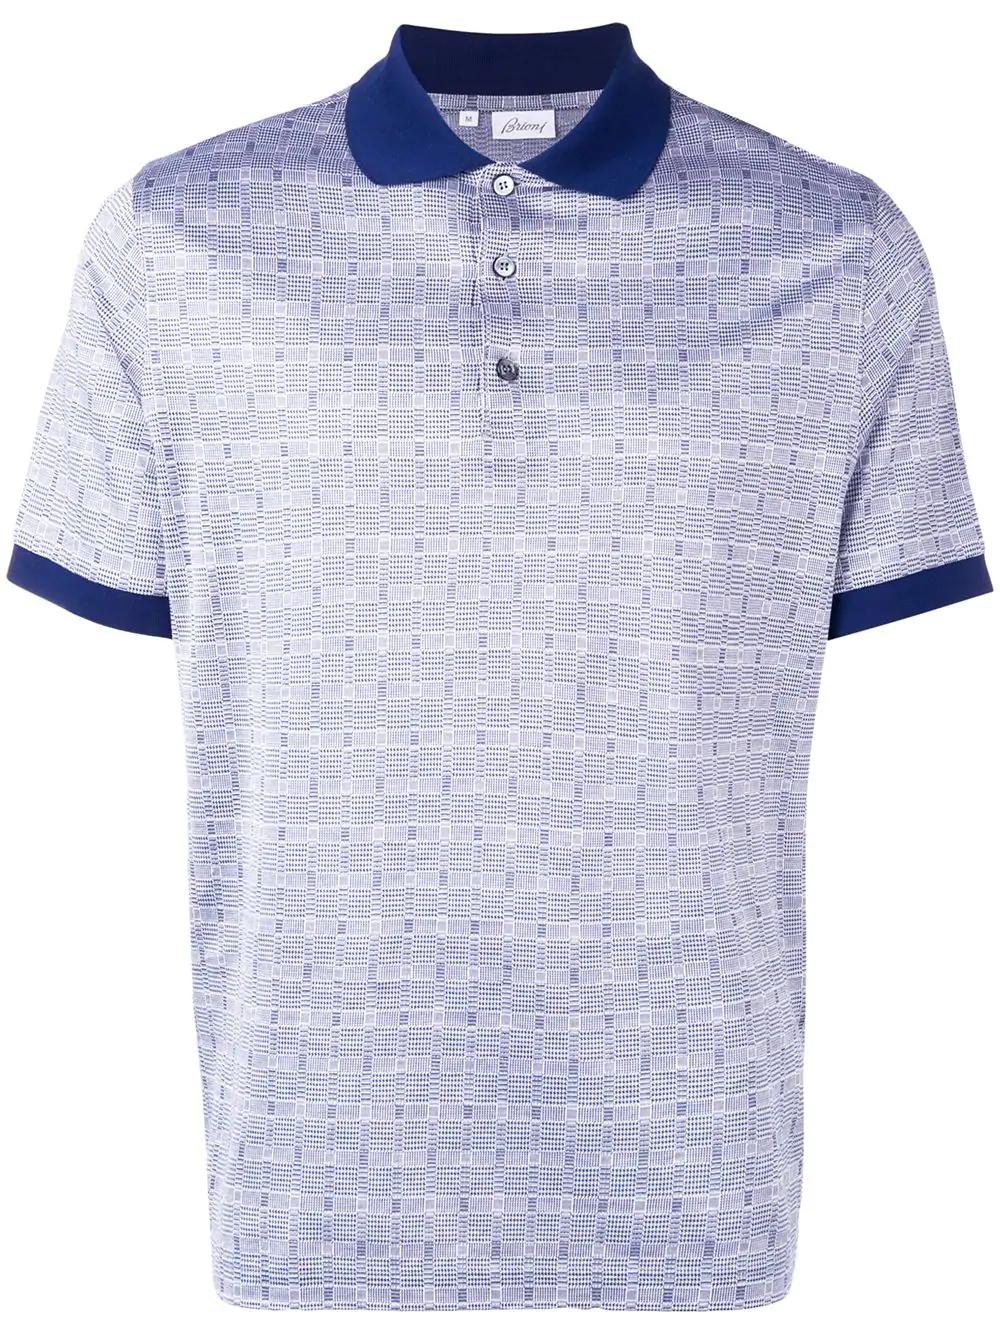 231d4adcbc1 Brioni Houndstooth Polo Shirt - Blue. Farfetch